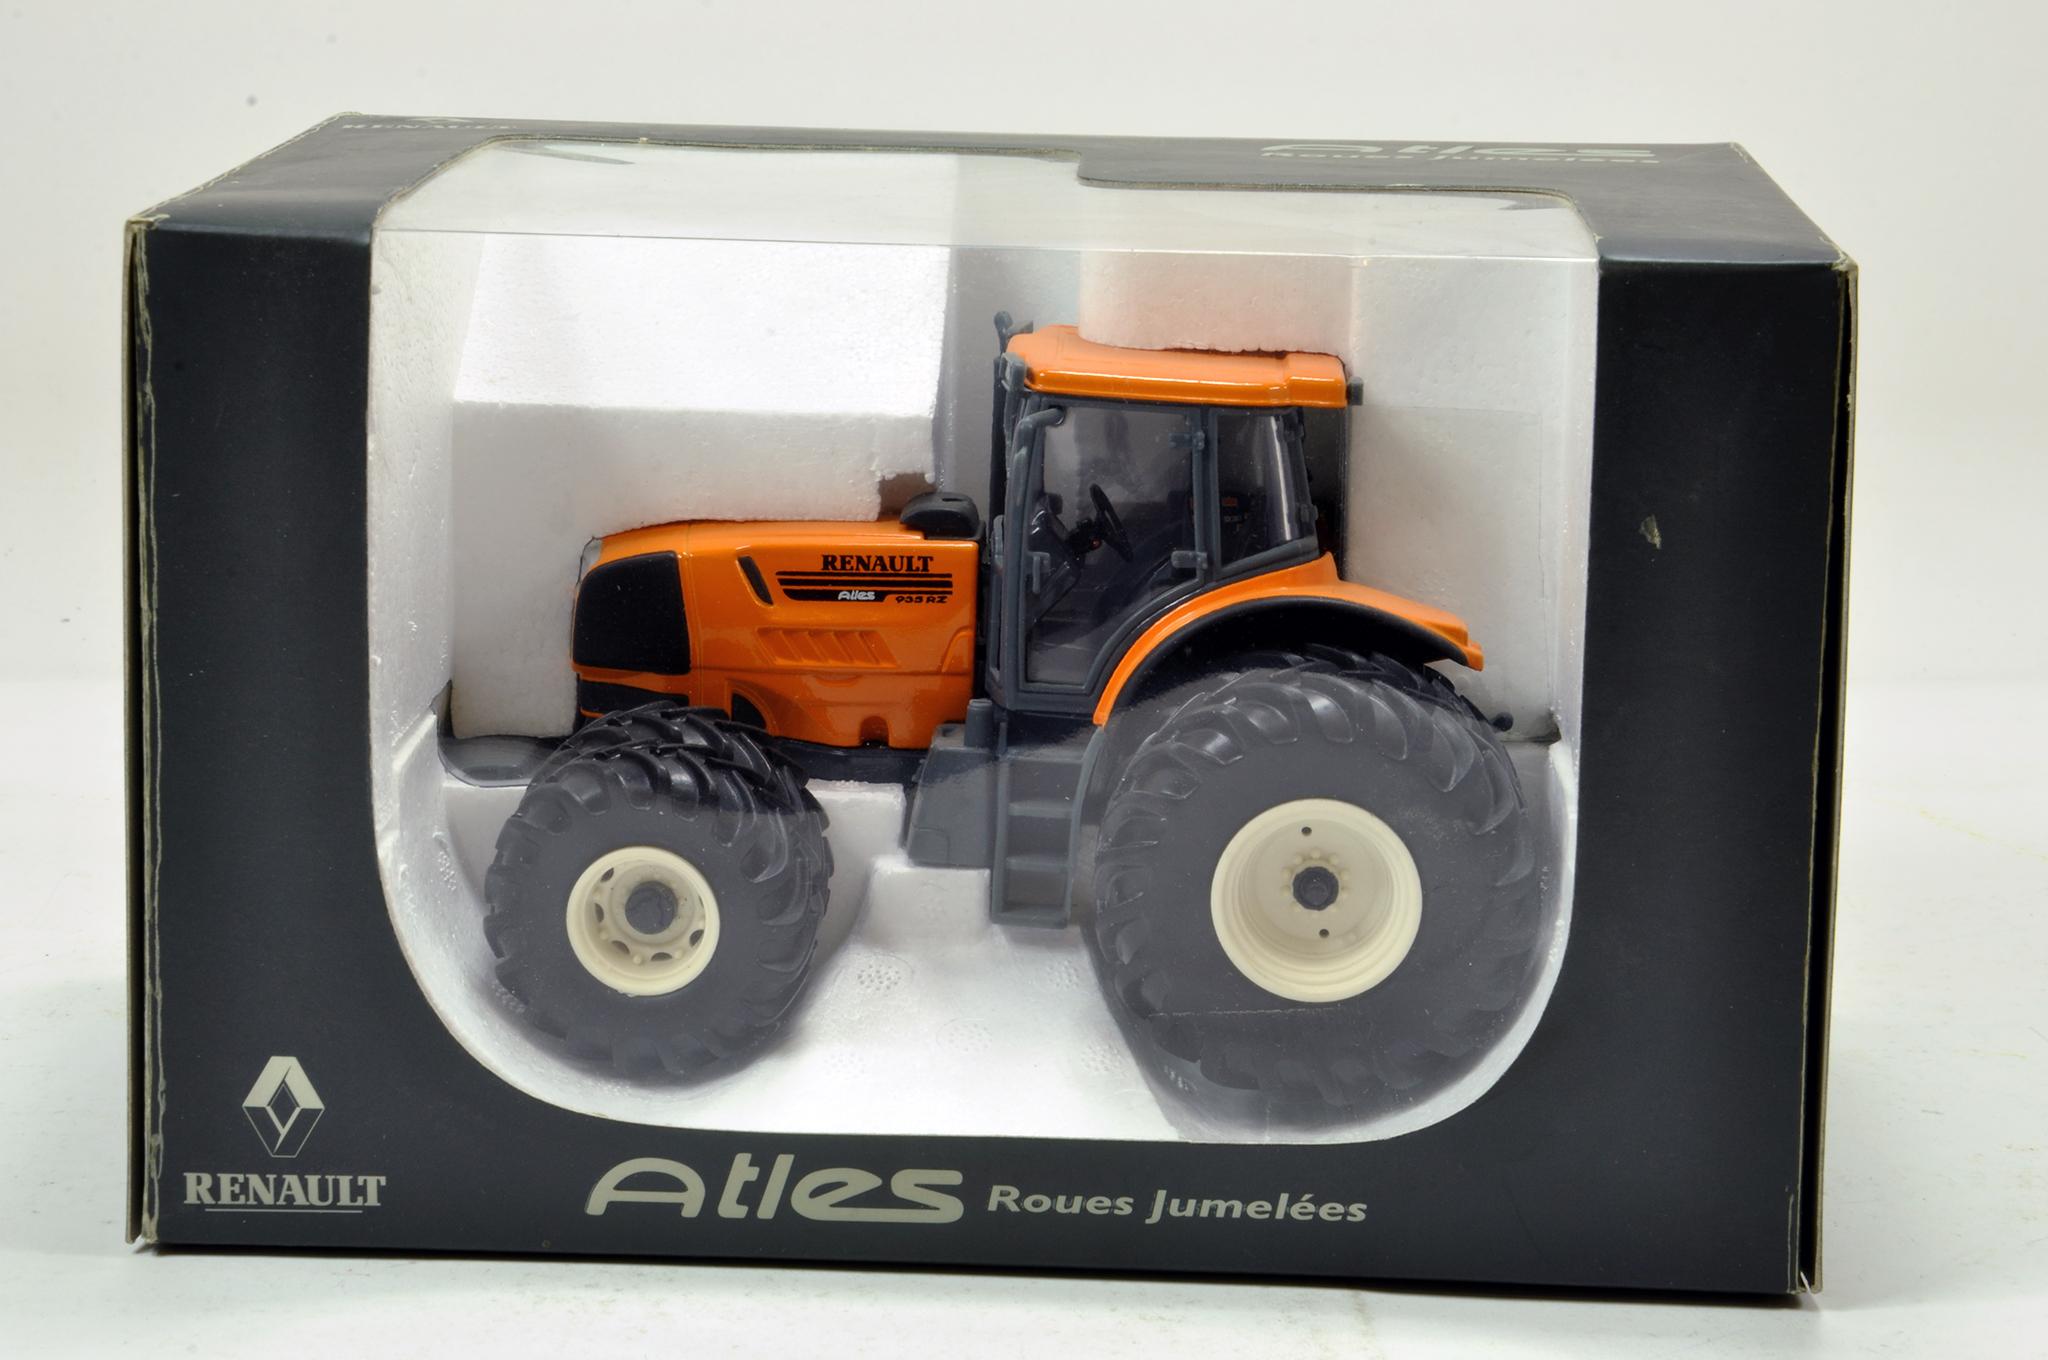 Lot 169 - Universal hobbies 1/32 Renault Atles 935RZ Dual Wheel Tractor. Generally excellent in box.